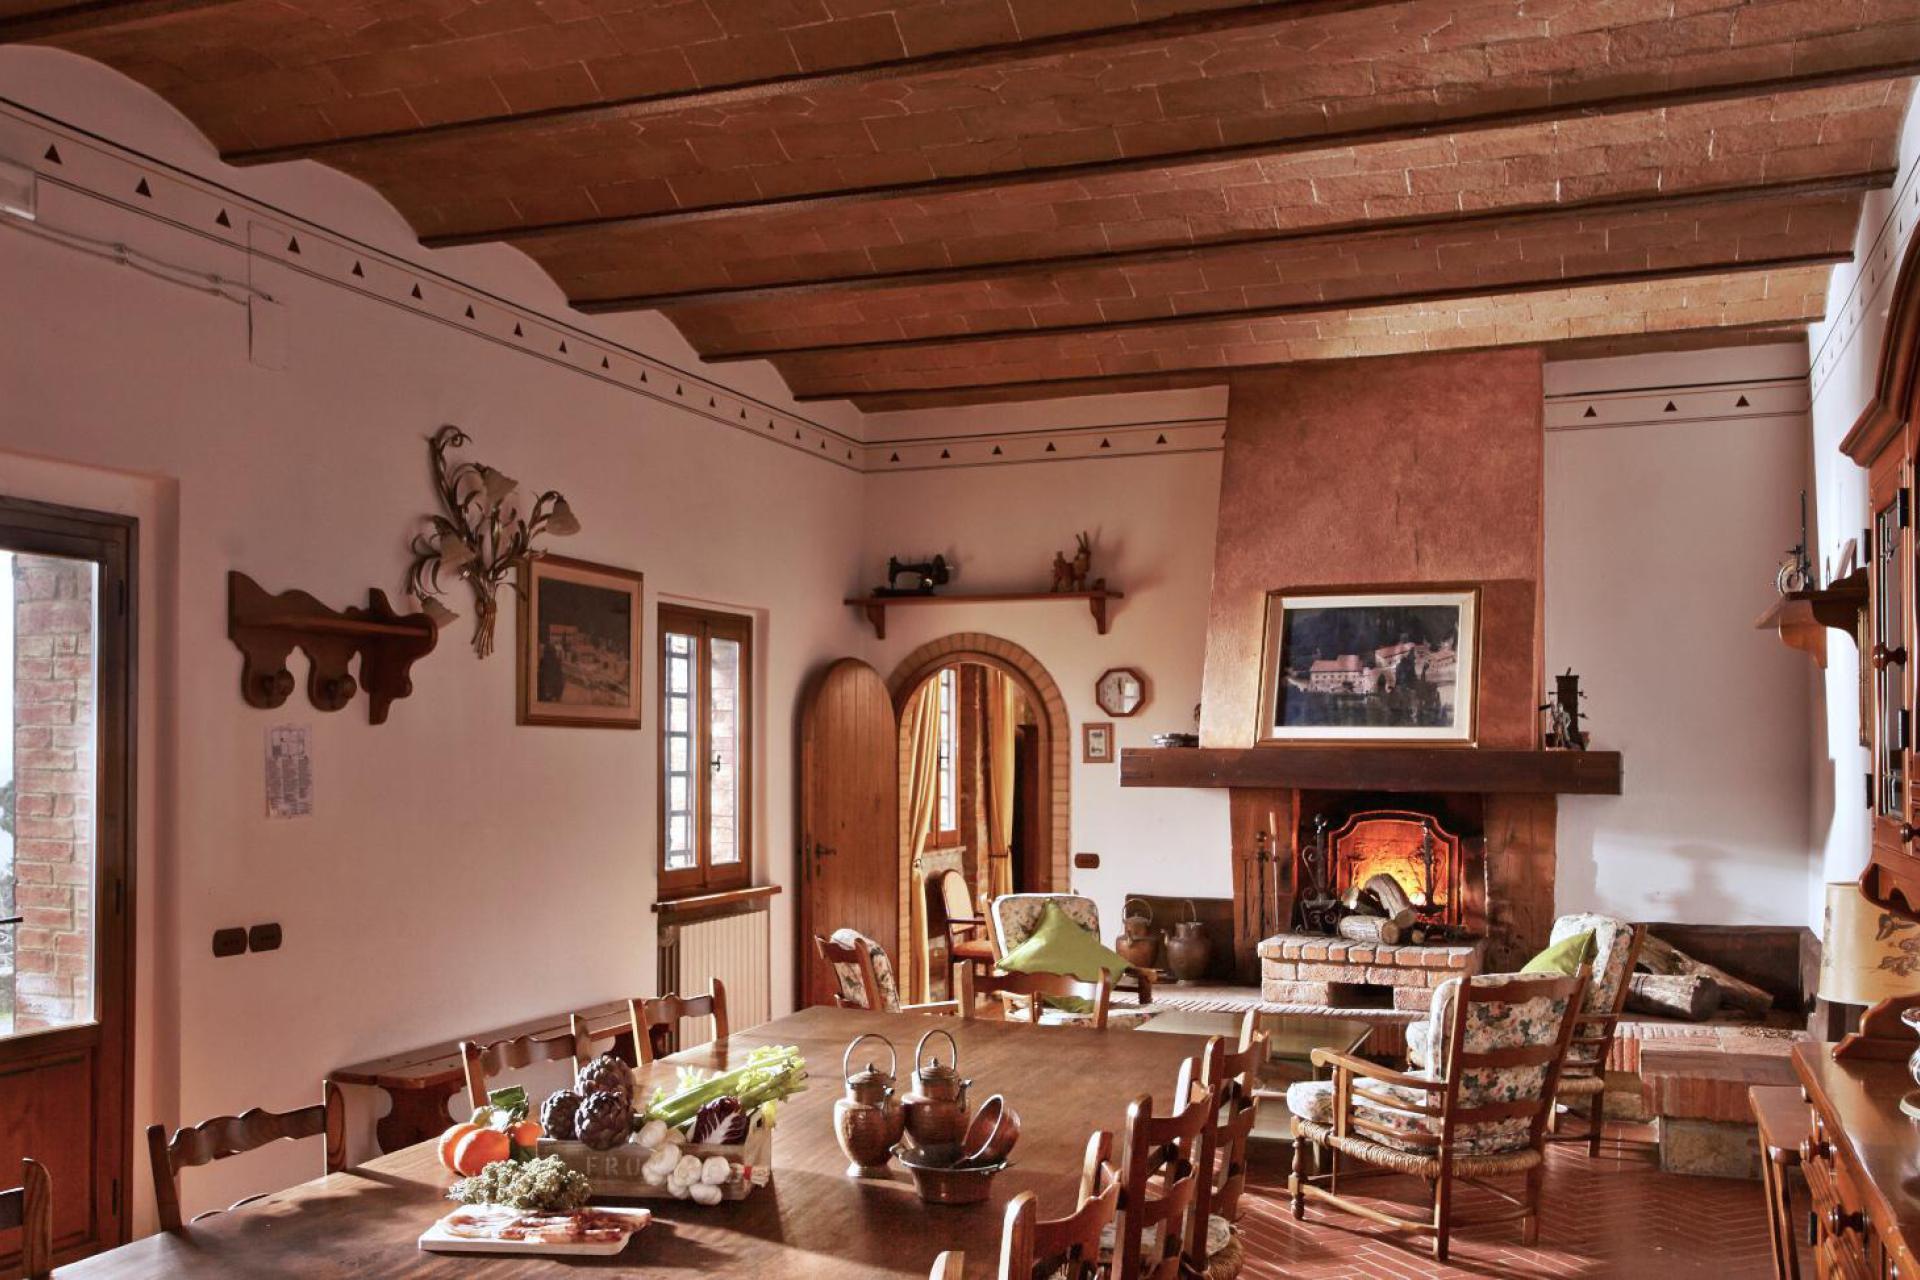 Agriturismo Lake Como and Lake Garda Finally a beautiful agriturismo near Lake Maggiore!